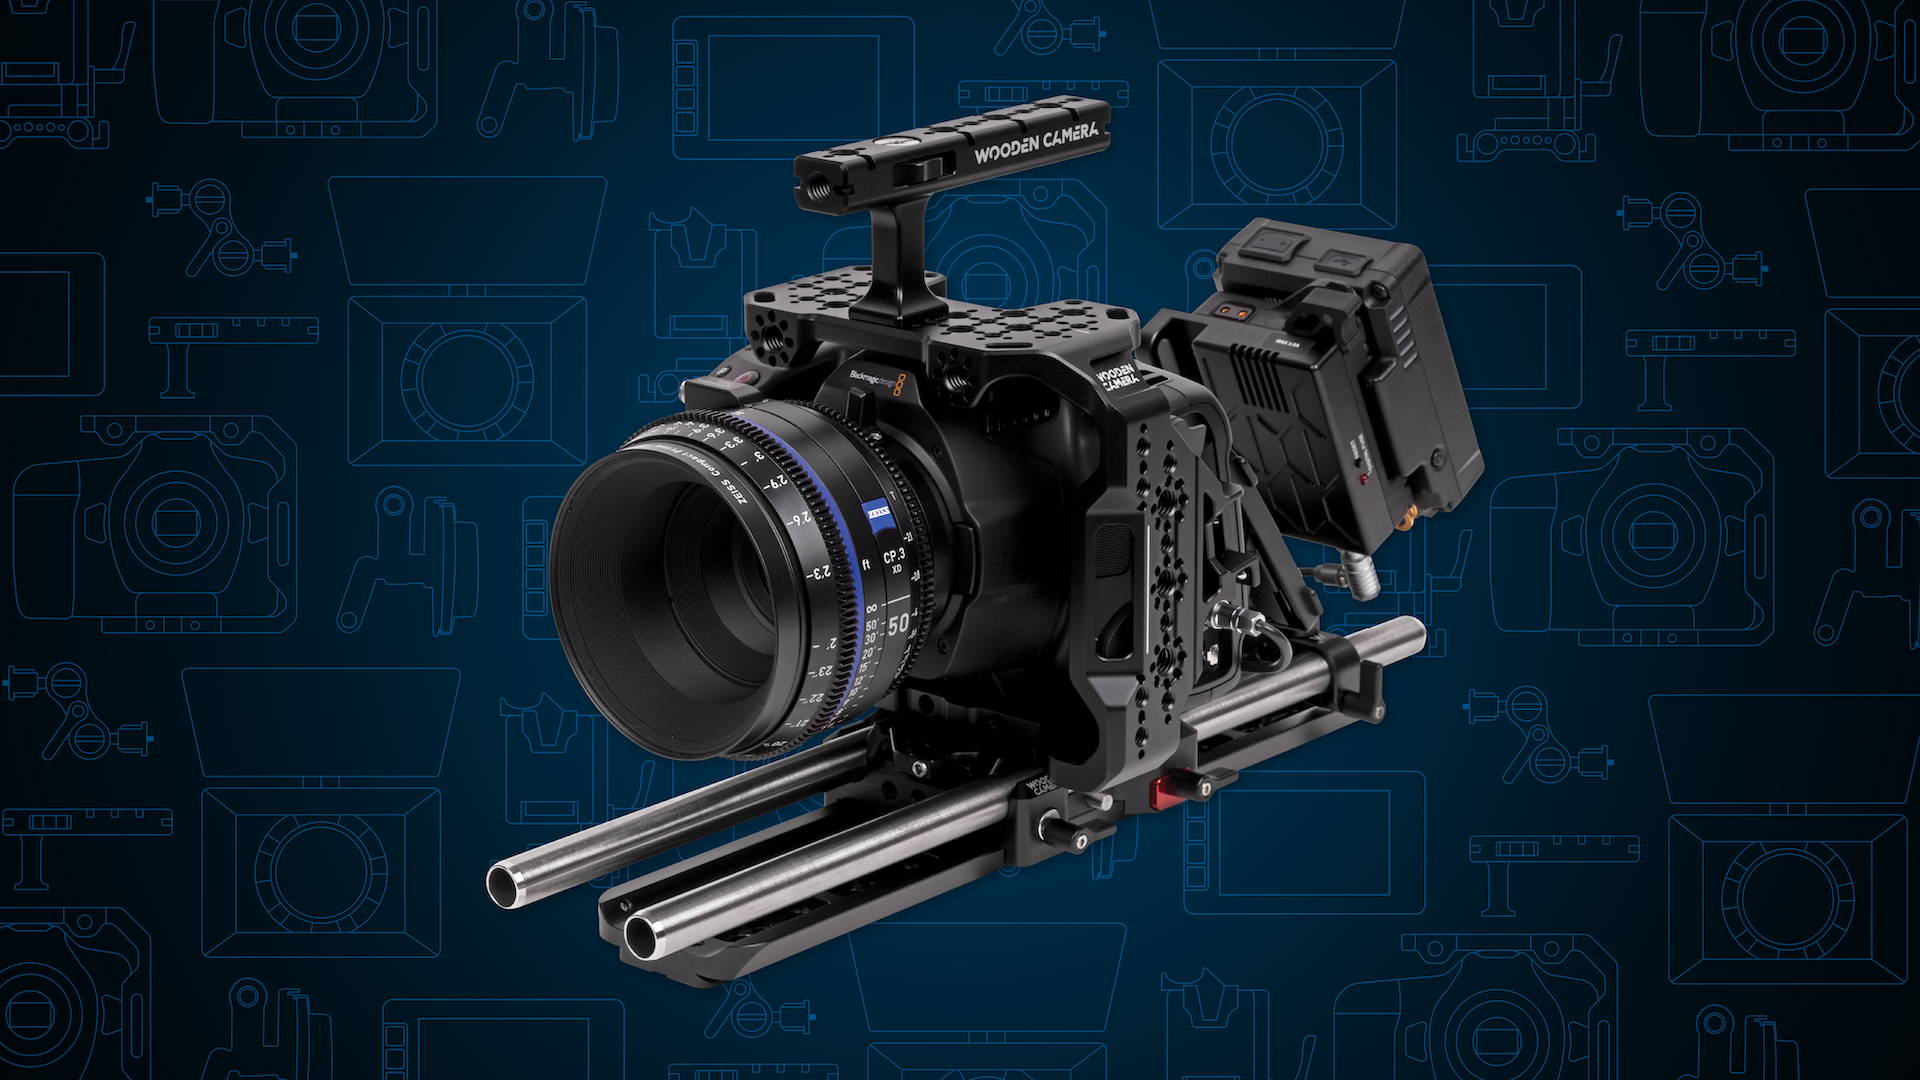 Wooden Camera's Blackmagic Pocket Cinema Camera 6K Pro, Top 10 Essential Accessories